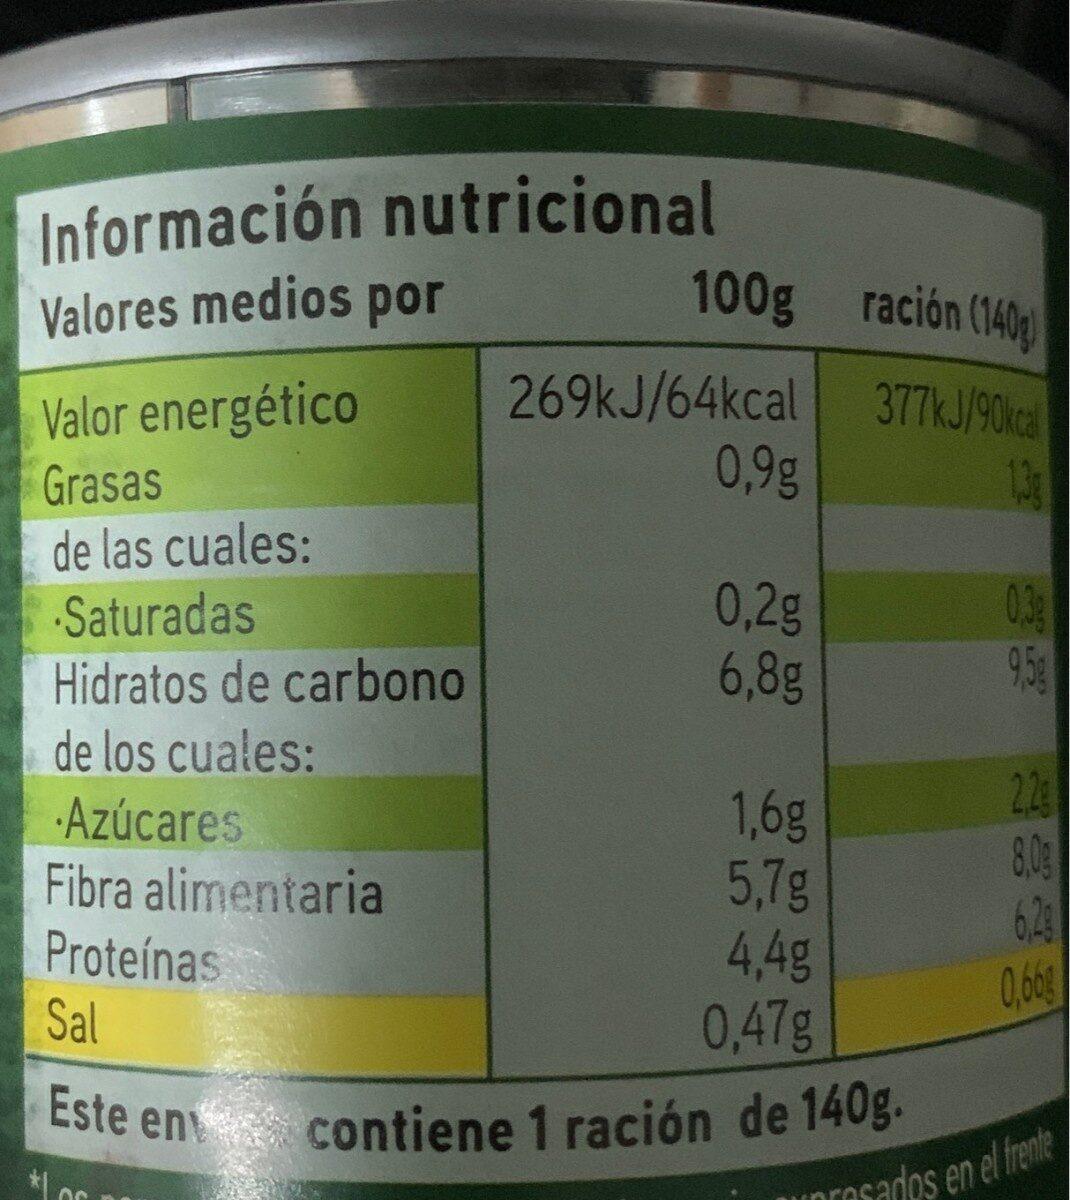 Guisantes al natural extrafinos - Nutrition facts